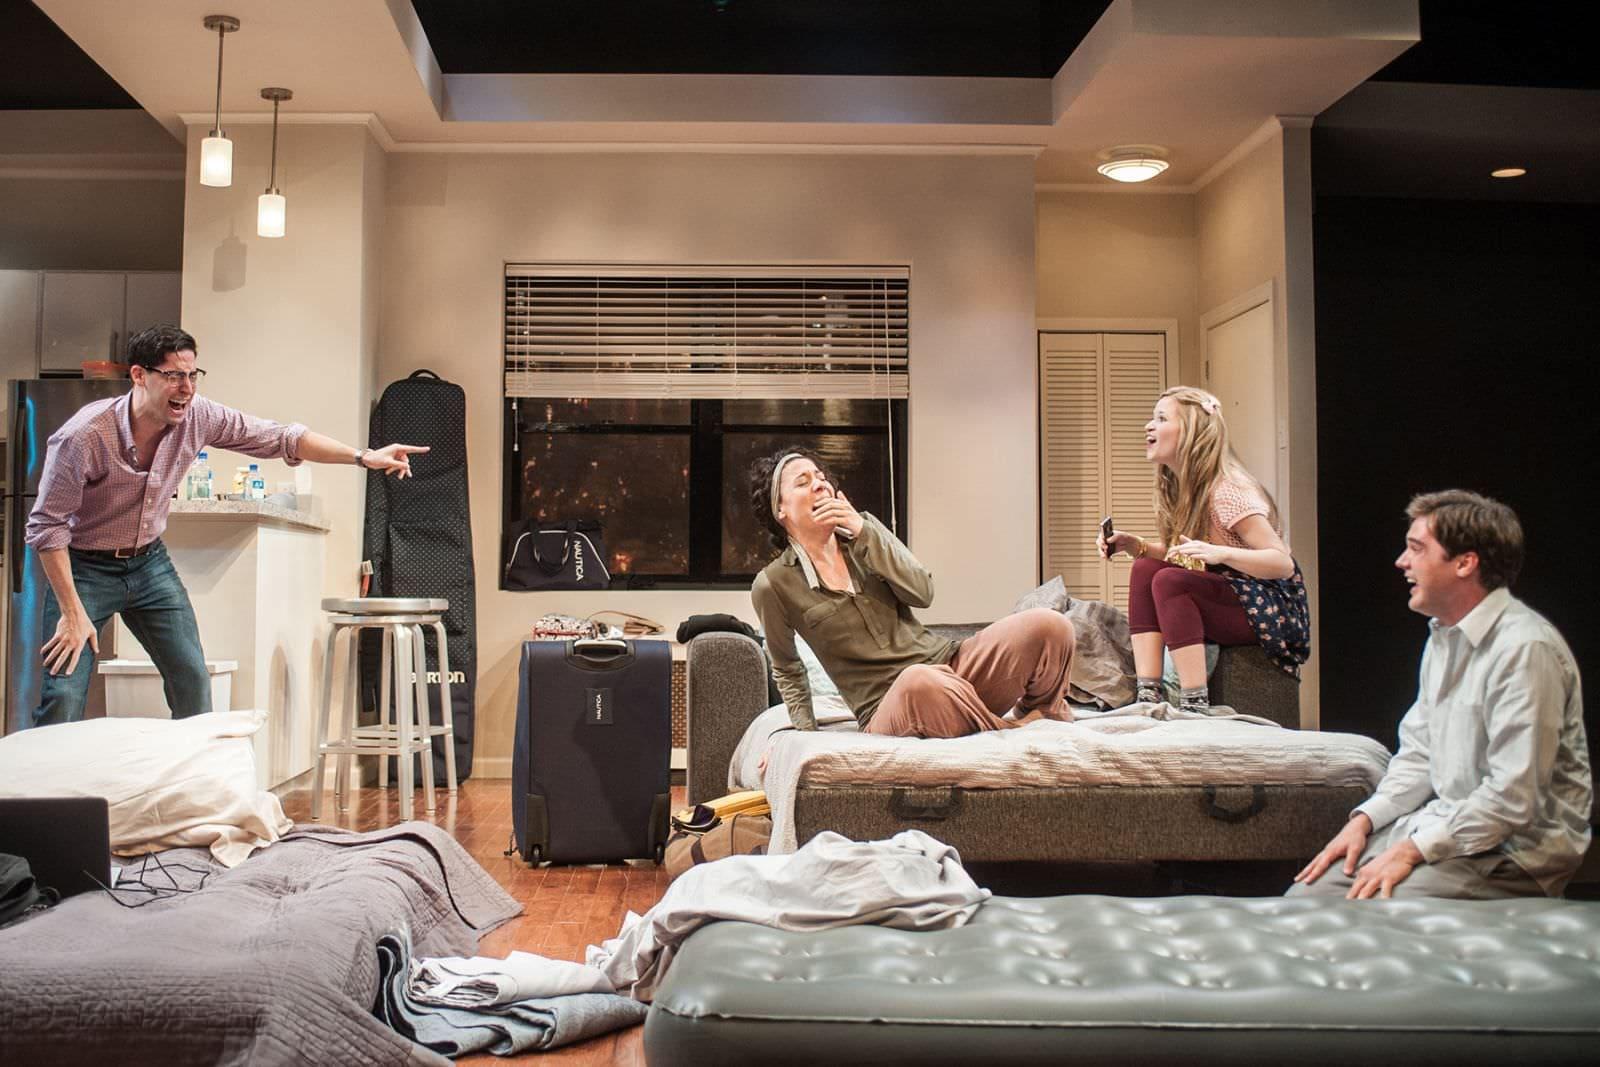 lex Mandell (Liam), Irene Sofia Lucio (Daphna), Maggie Erwin (Melody), and Joe Paulik (Jonah). Photo by Teddy Wolff.